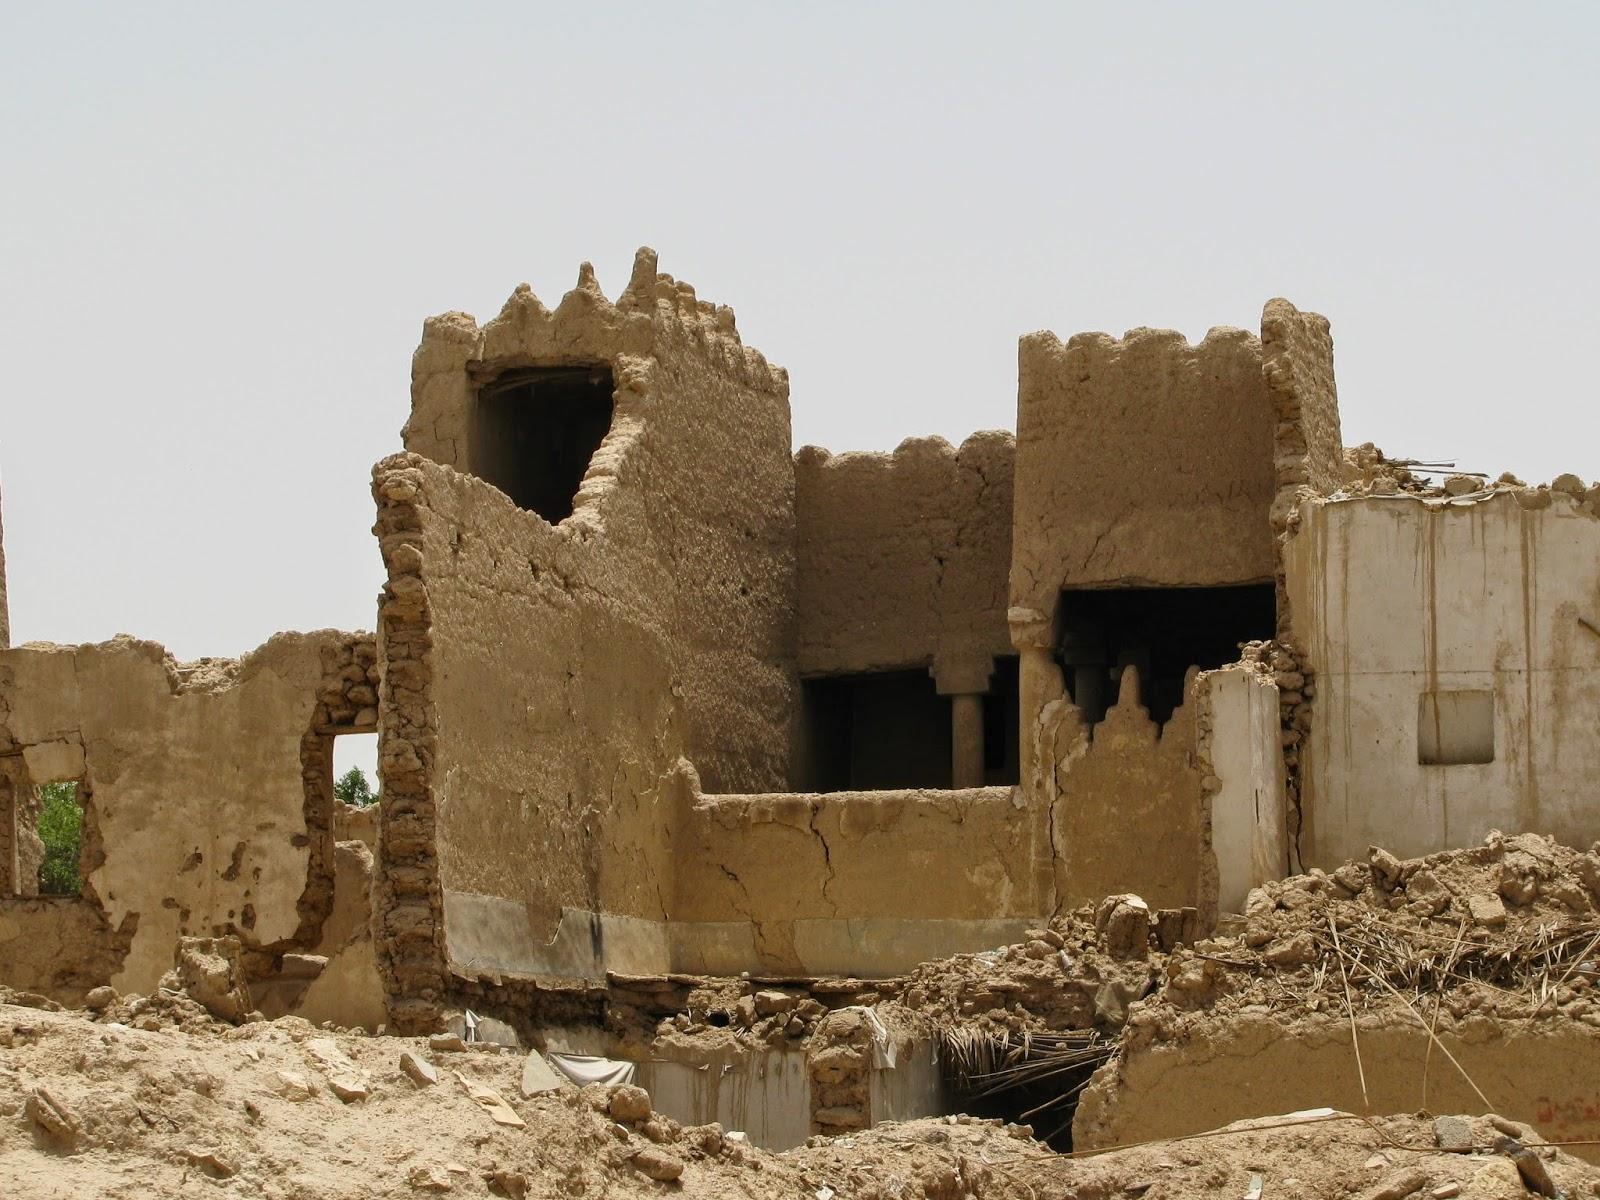 Saudi Arabia The Mud Houses Of Old Riyadh Minor Sights